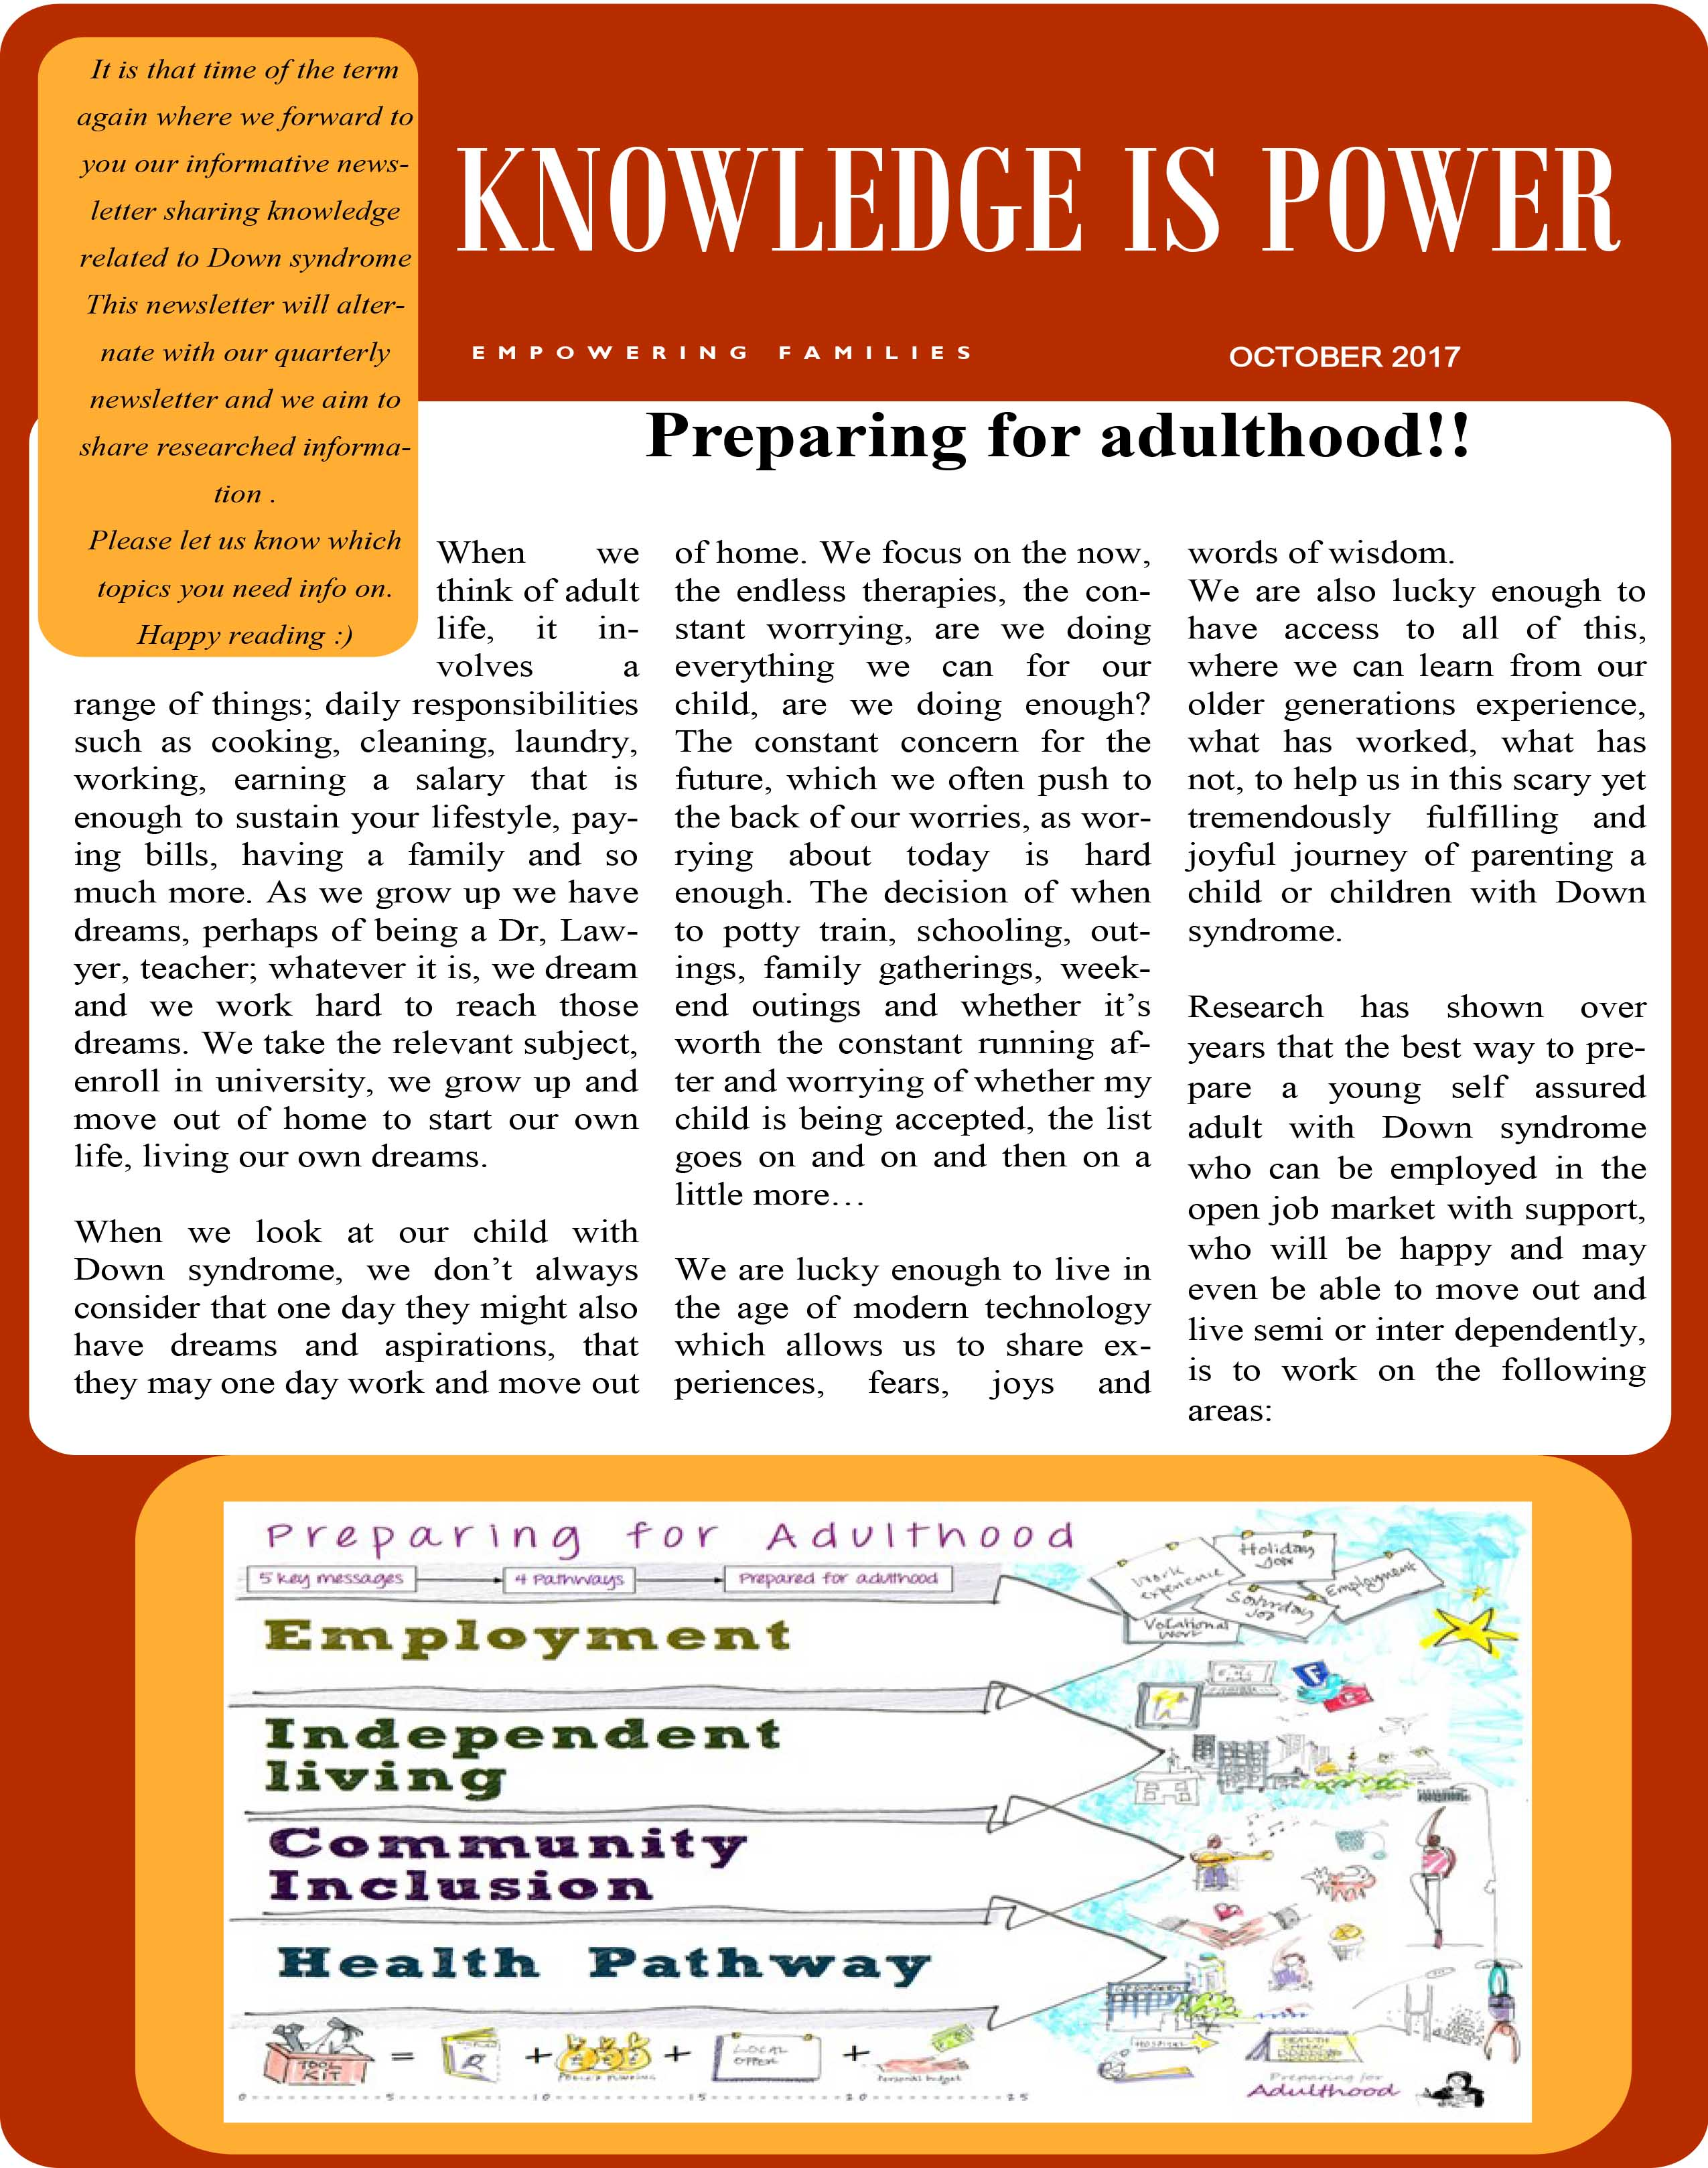 info news 3 employment image